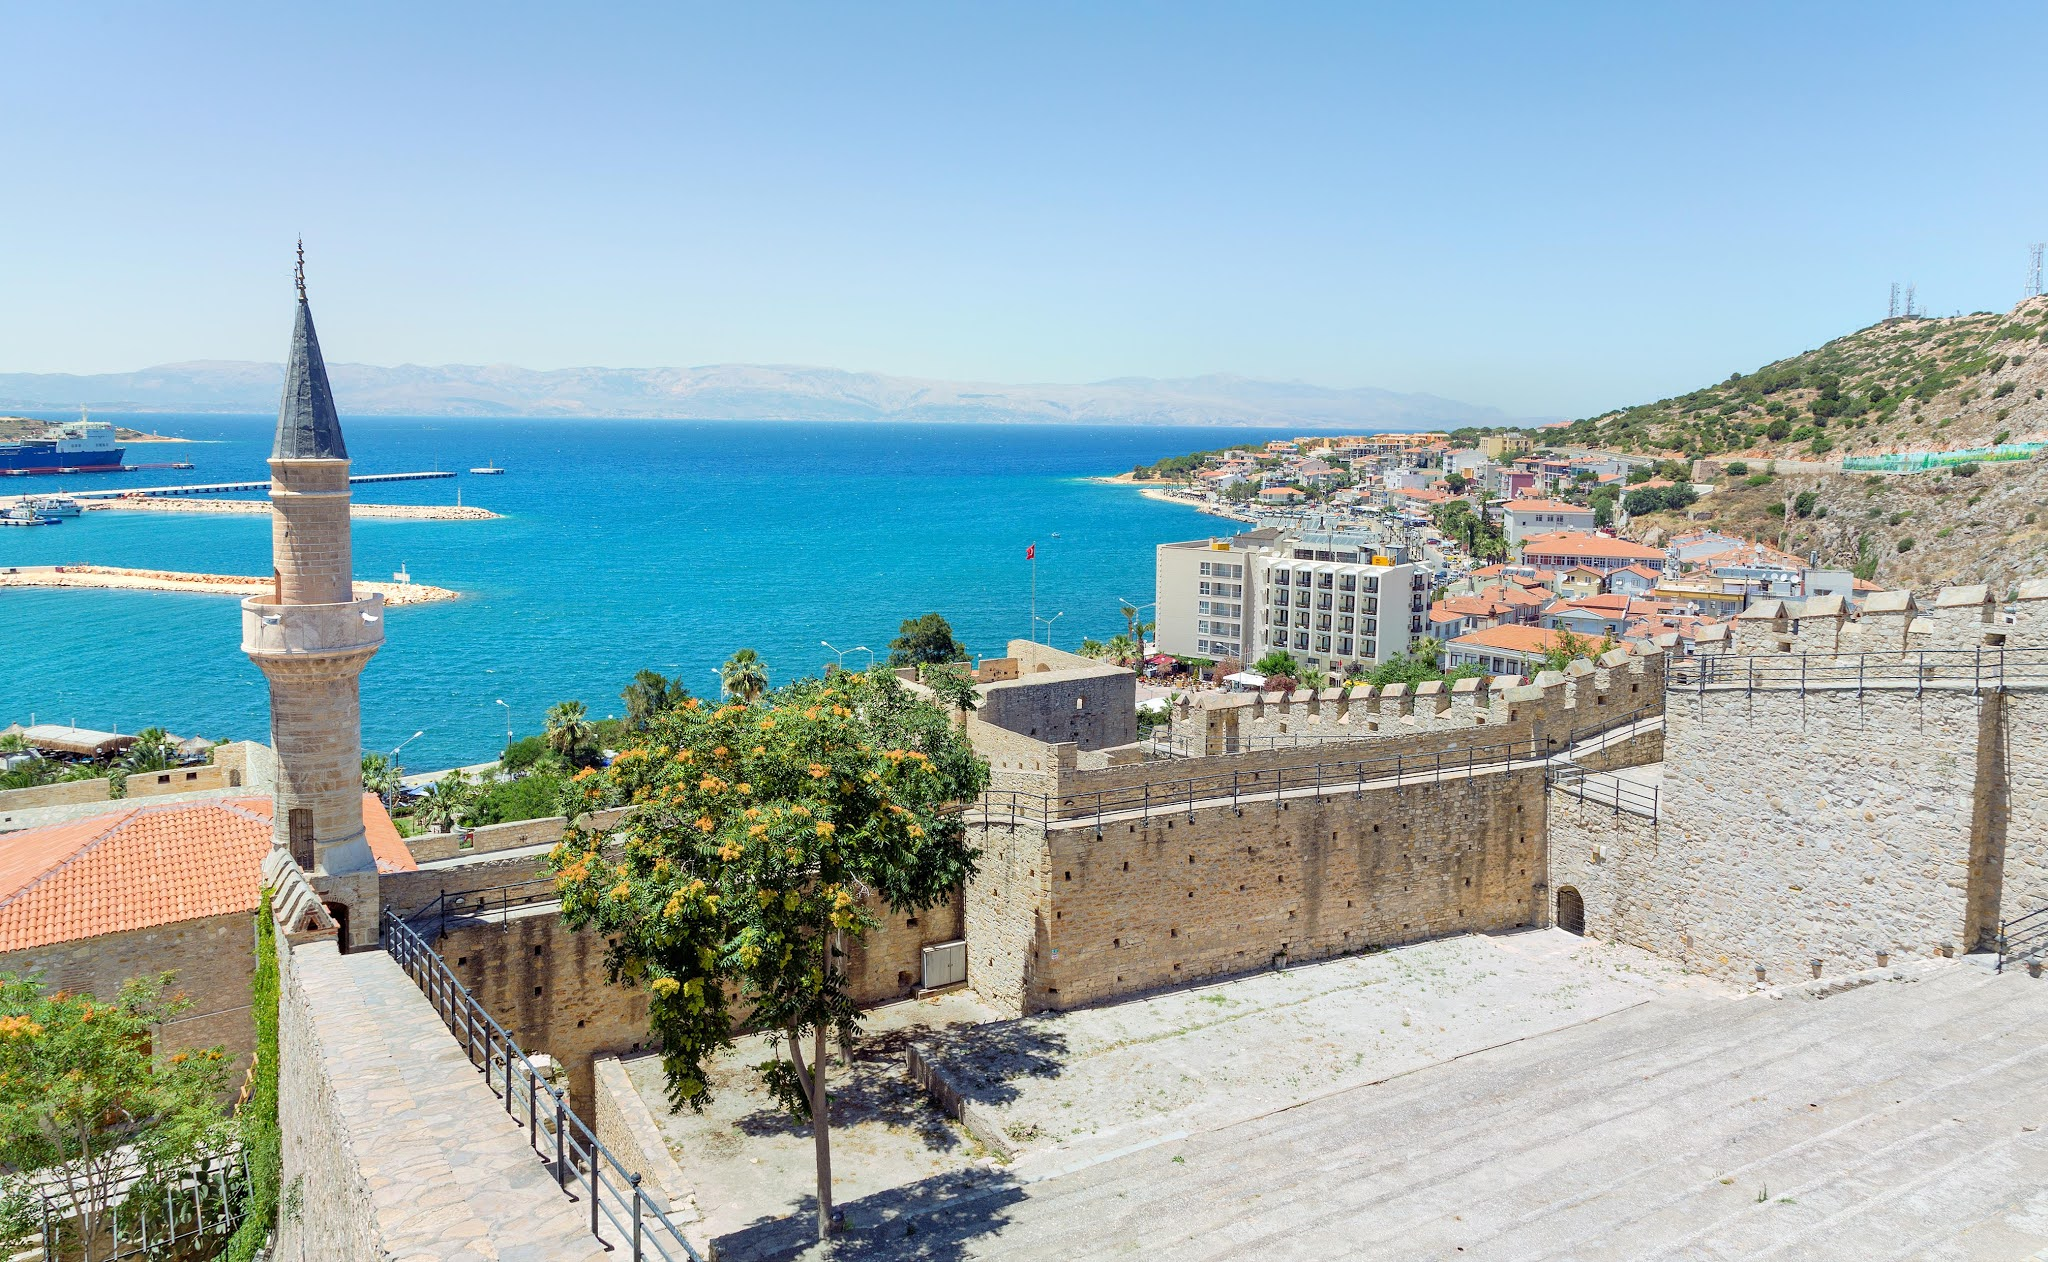 Tourism in Alaçatı ... The splendor of entertainment on the Turkish shores